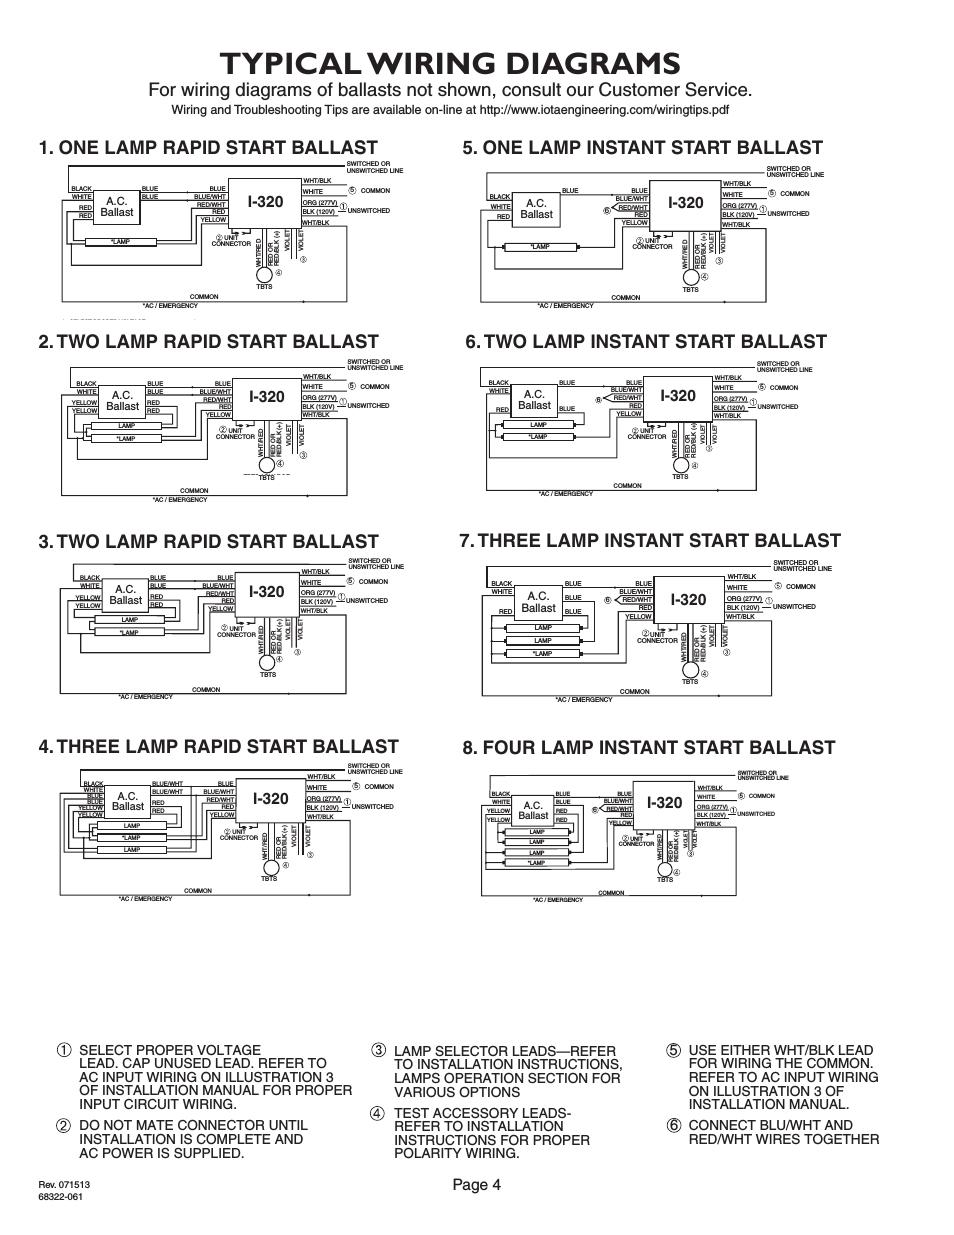 Rapid Start Ballast Wiring Diagram Libraries F20t12 Iota Emergency Box Diagramiota Schema